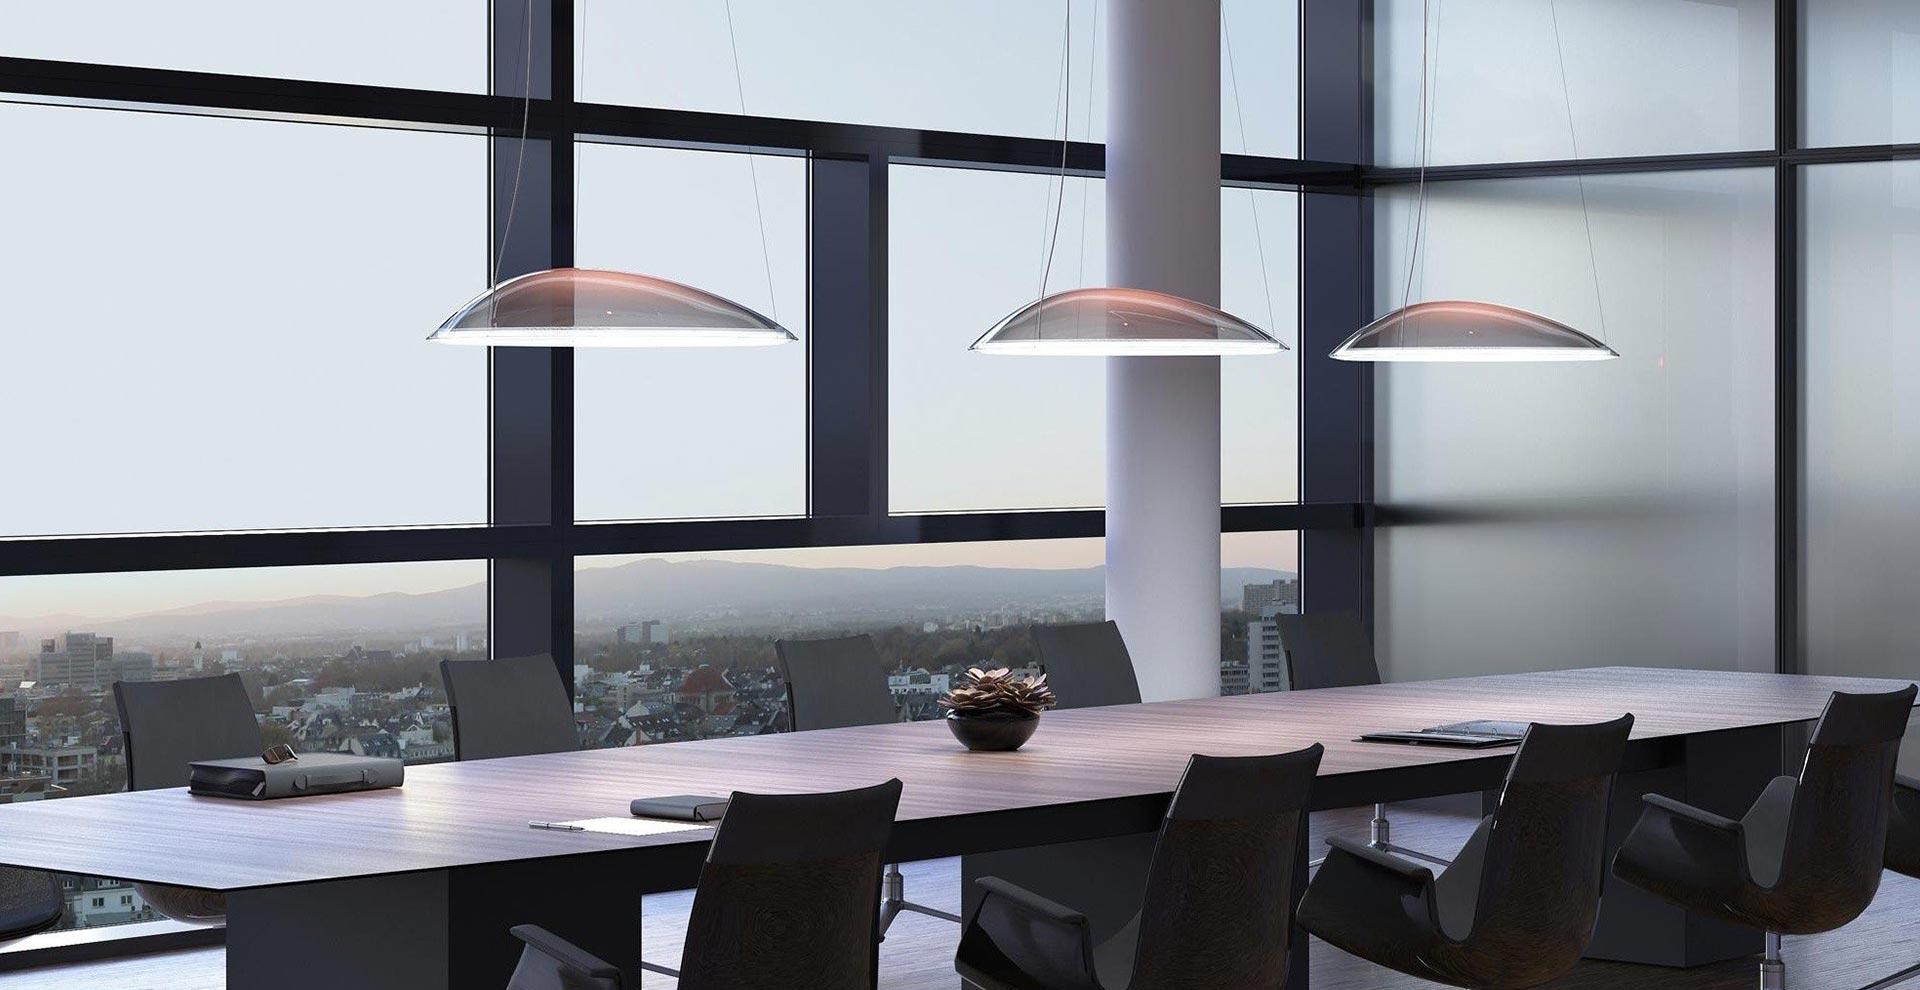 Artemide Illuminazione Lavora Con Noi : Ameluna artemide lampada ameluna artemide lampada a